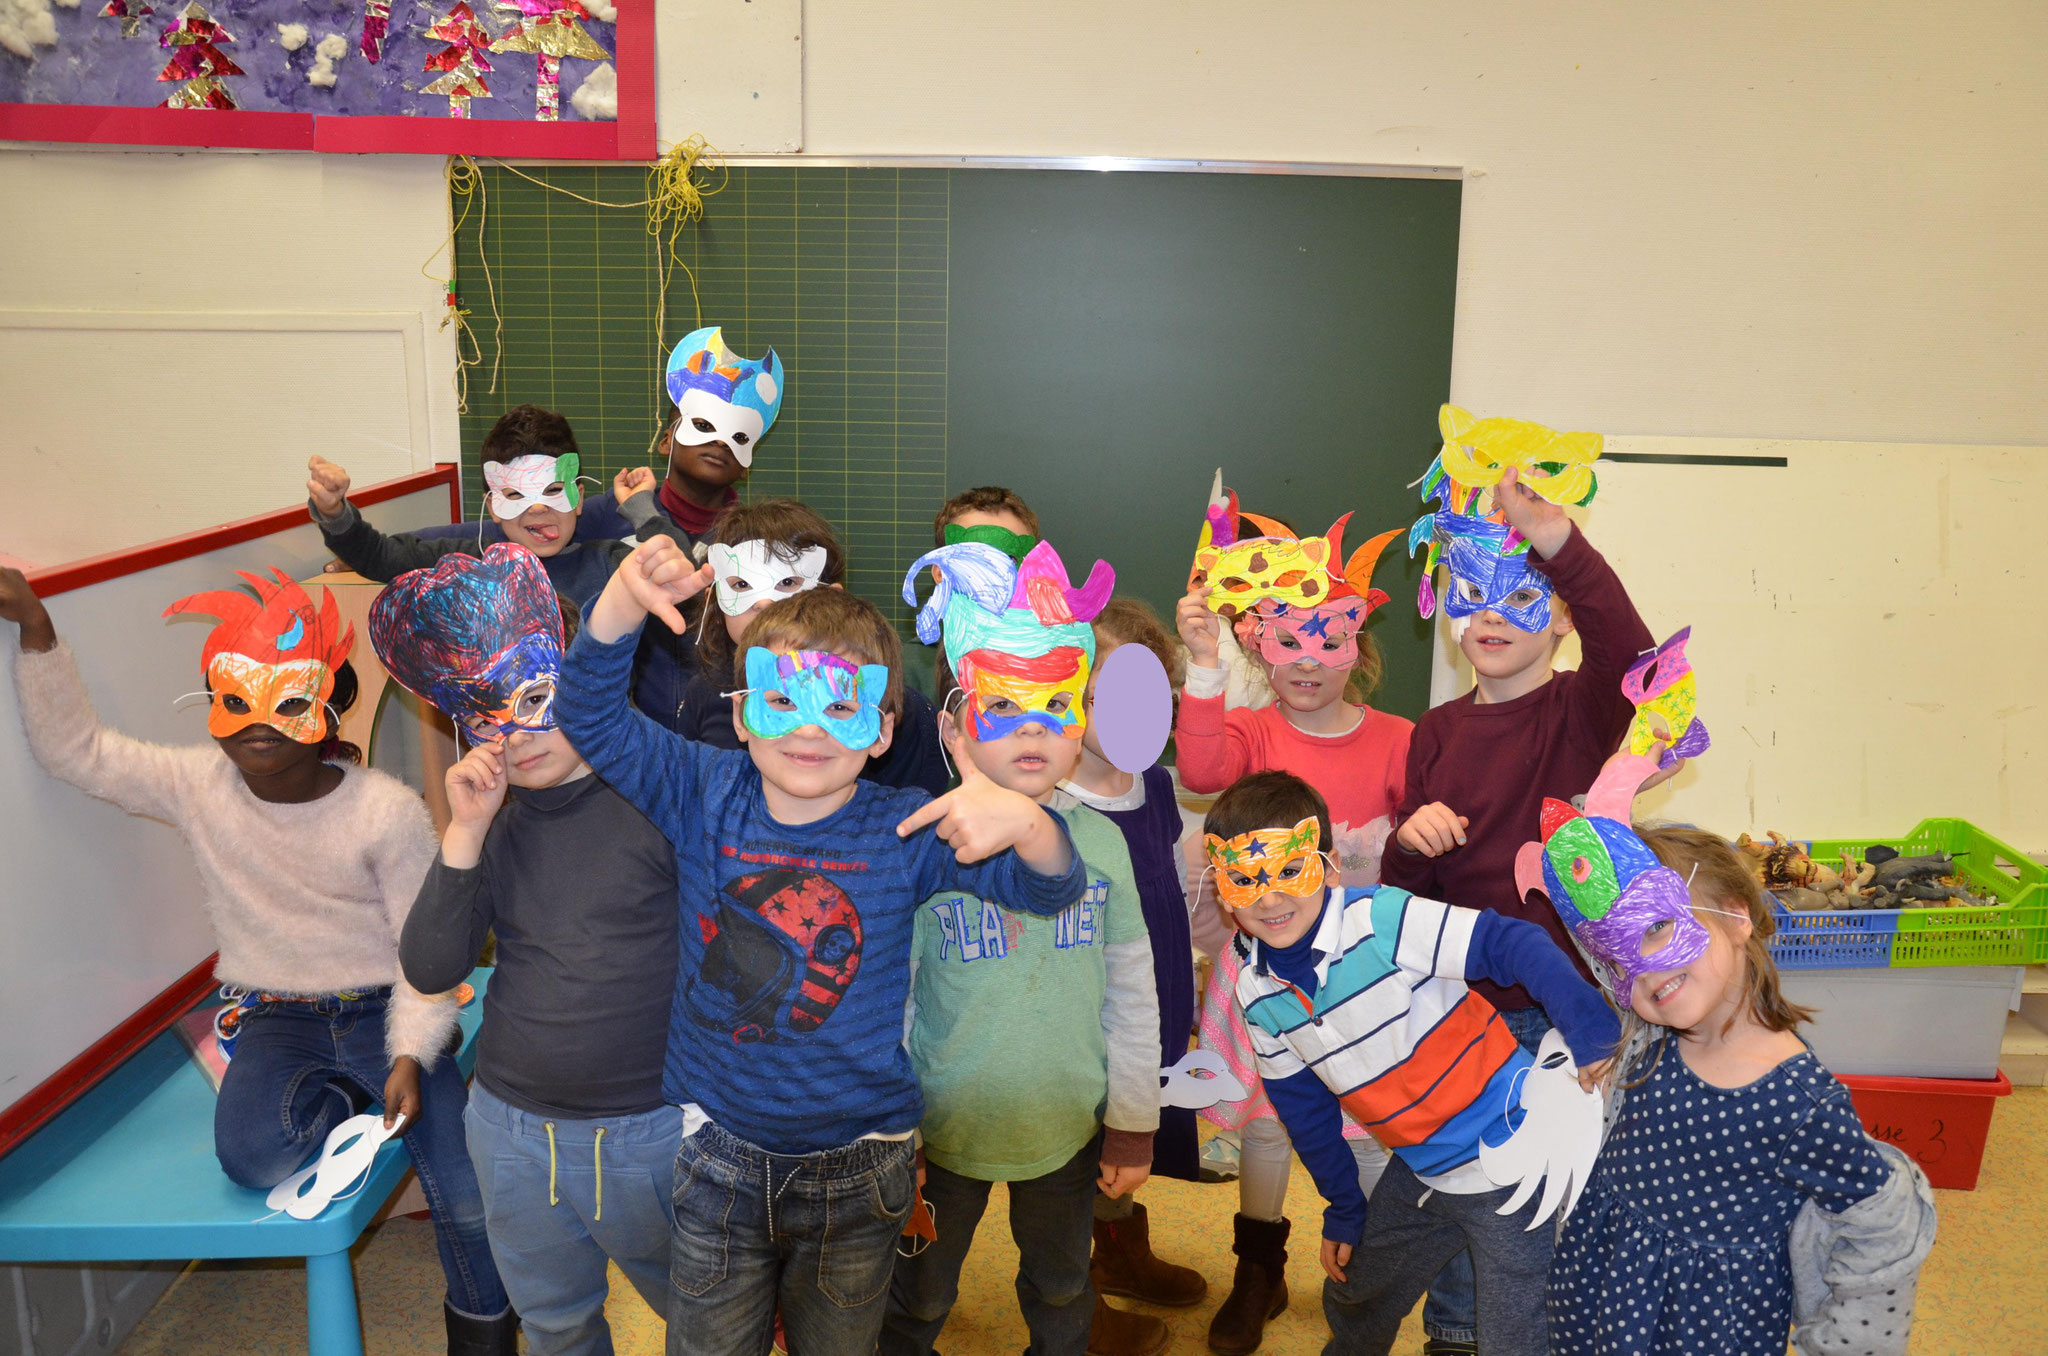 Les deuxièmes Masques de Carnaval